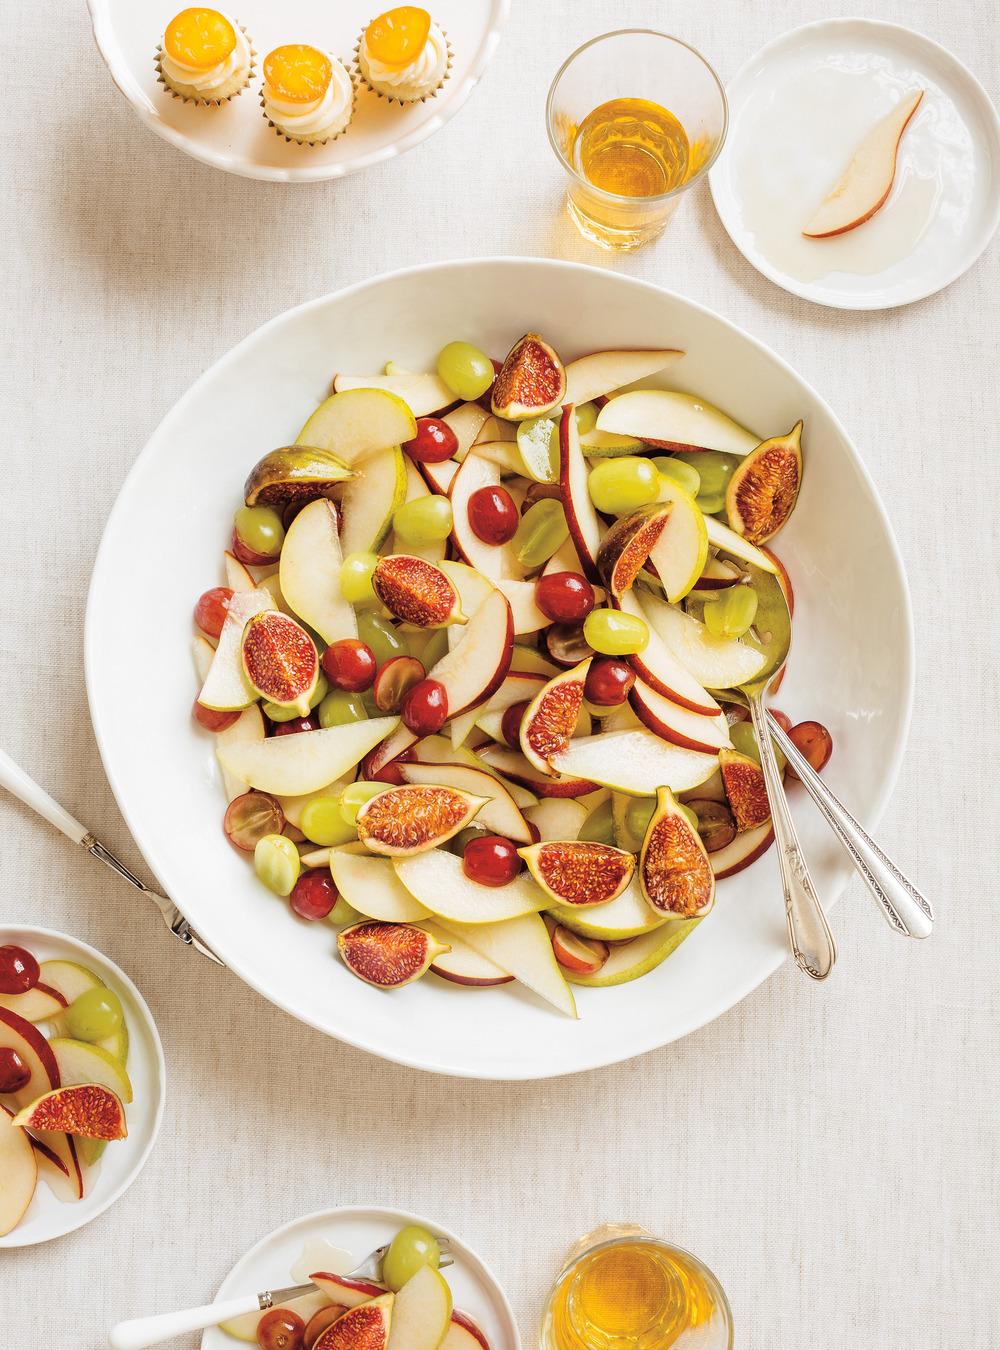 Salade de poires et de raisins | ricardo